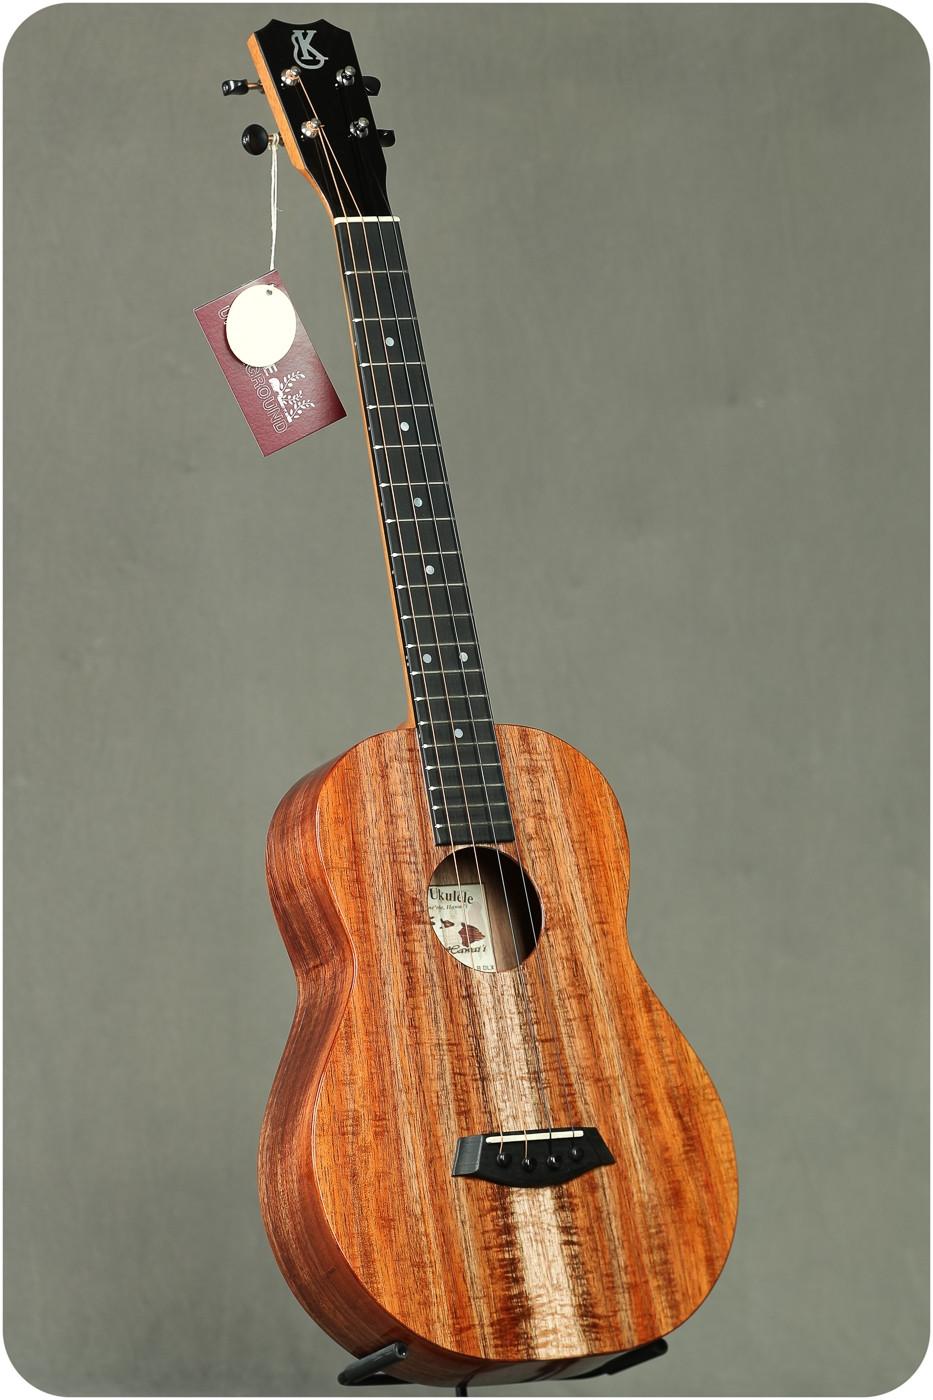 Kanile'a Koa Gloss Baritone (K-1 B DLX Tru-R G #21957)